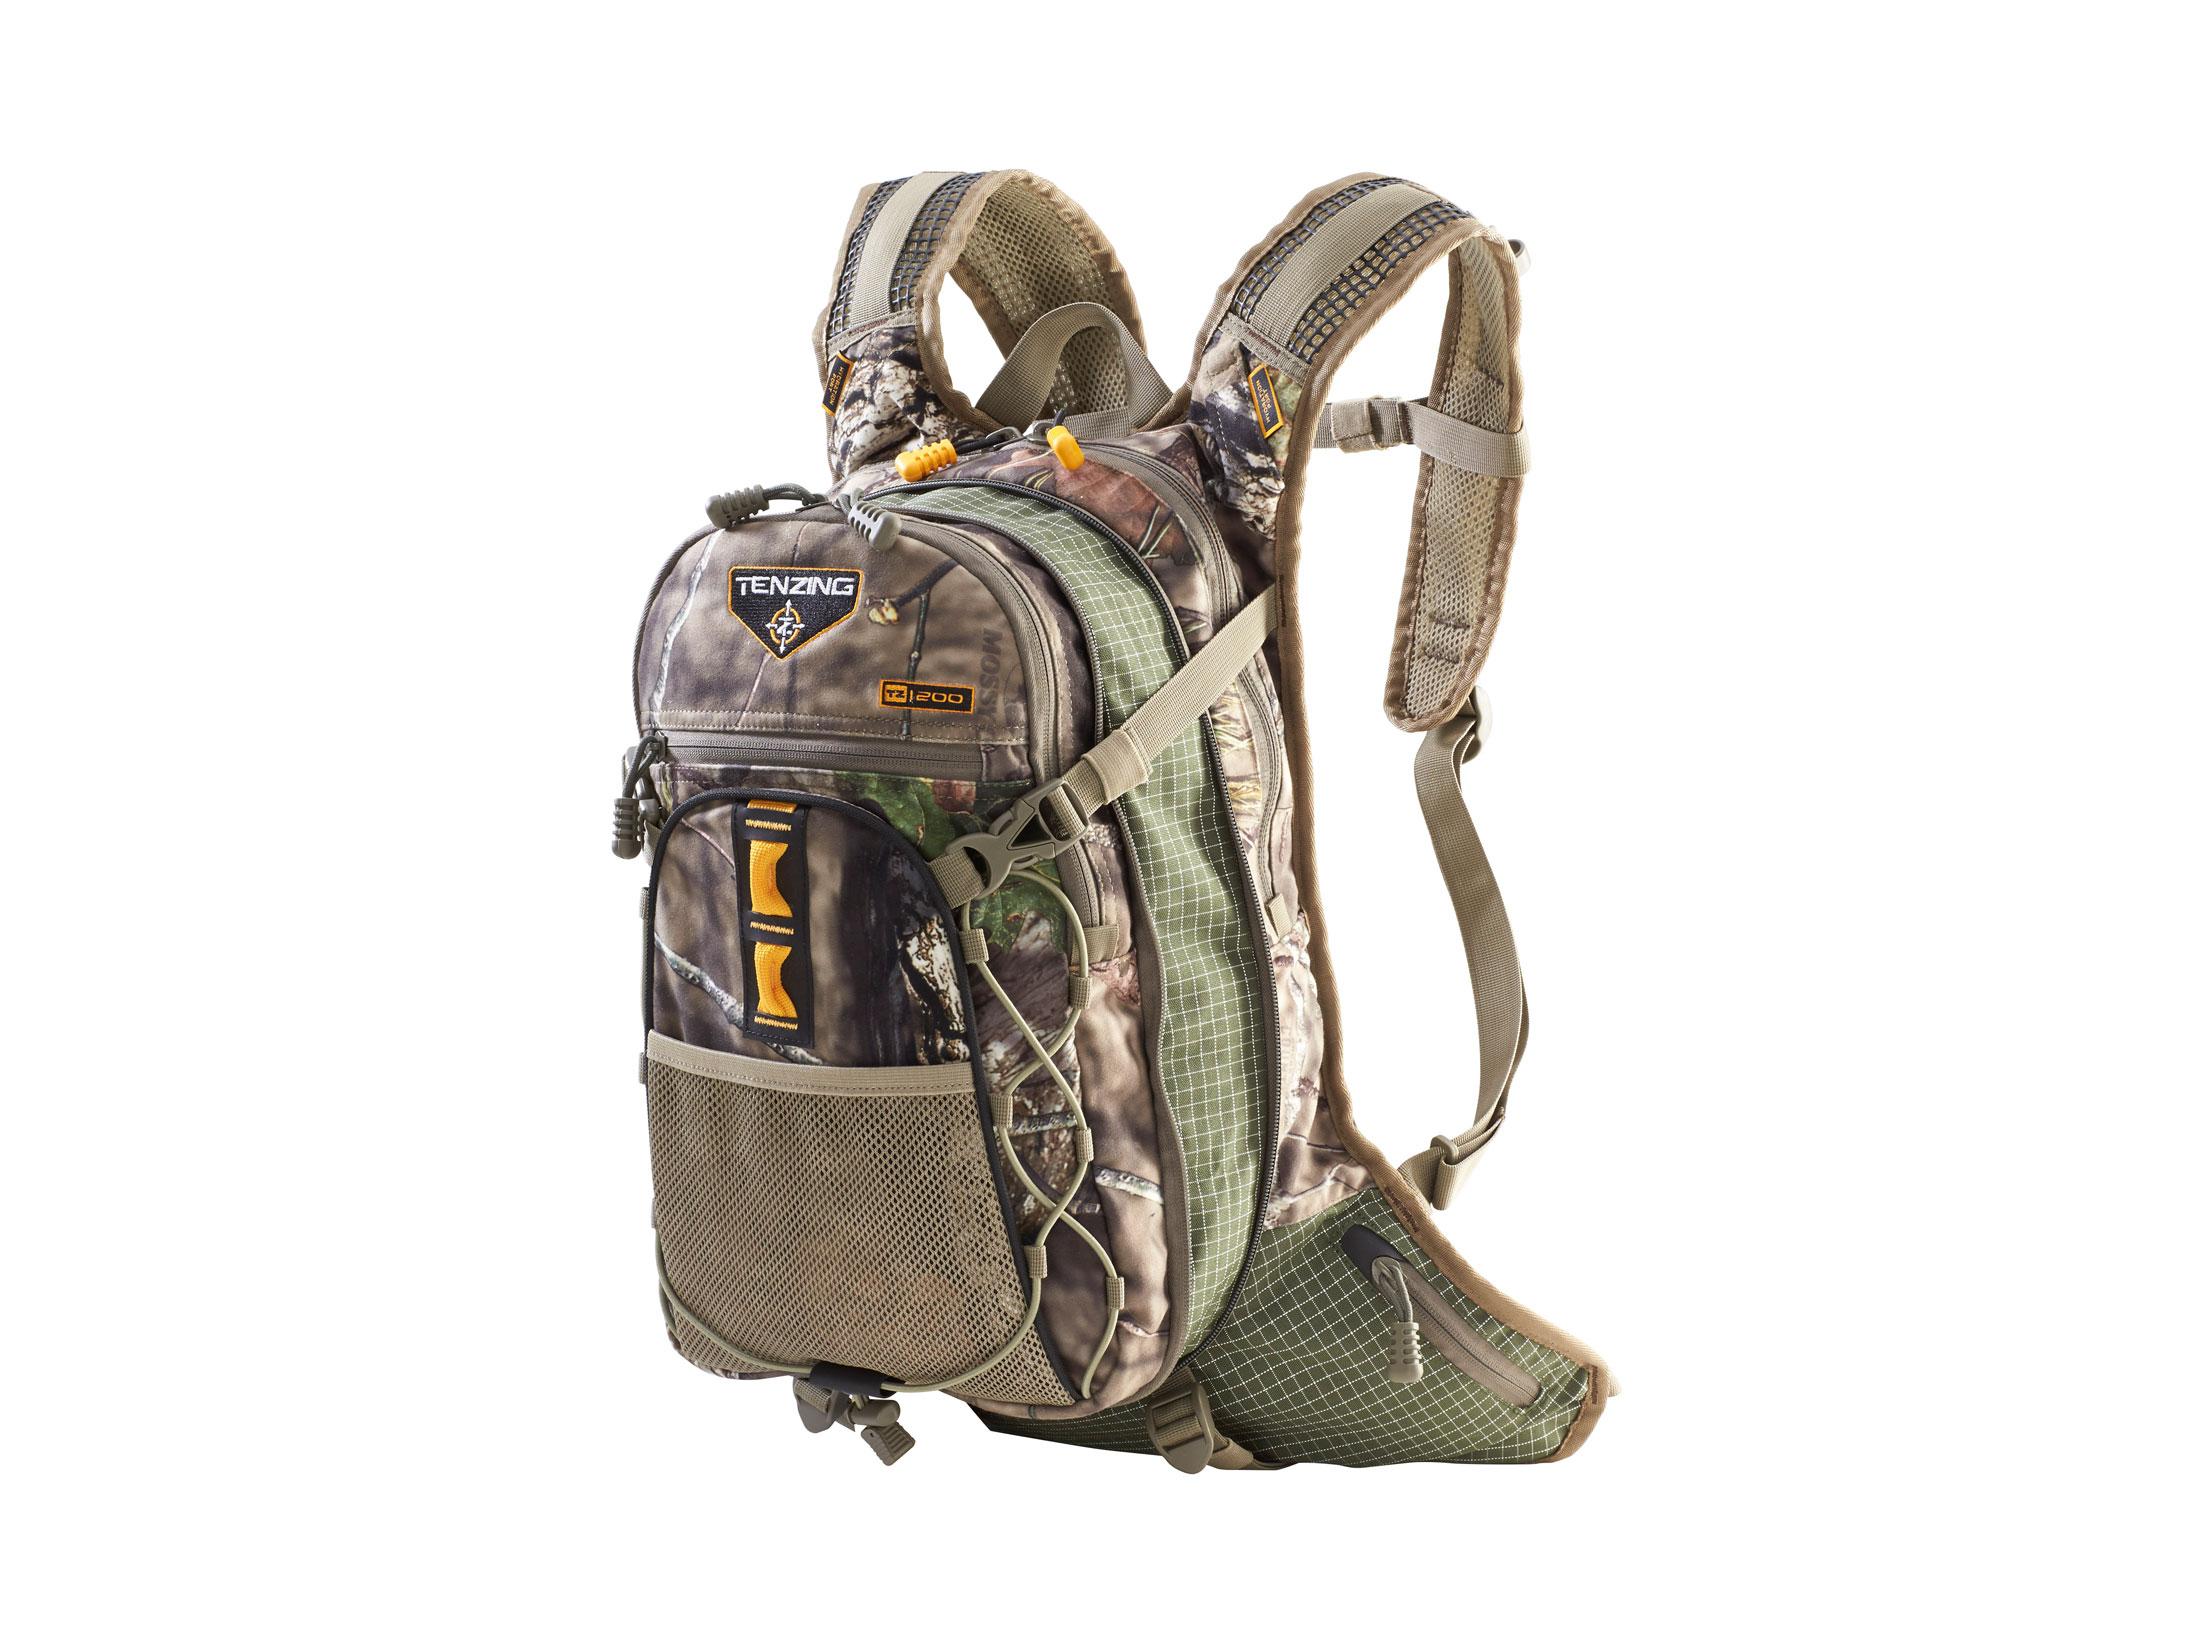 Tenzing TZ 1200 Ultra Light Day Pack Mochila de caza